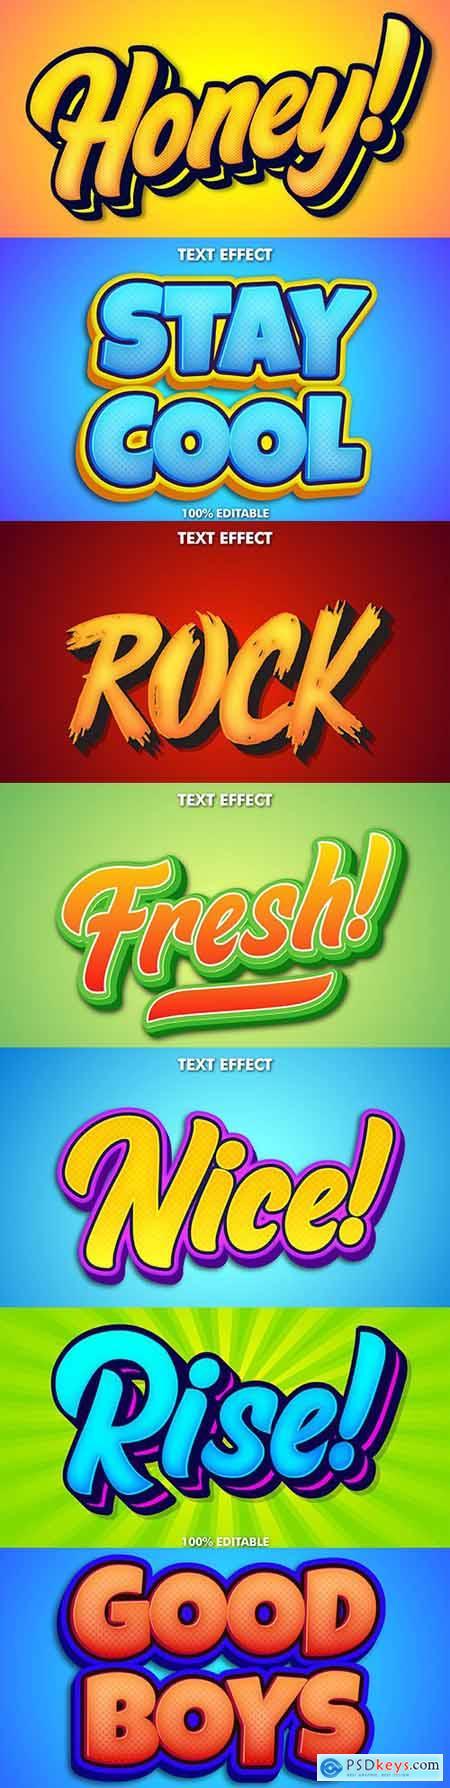 Editable font effect text collection illustration design 46